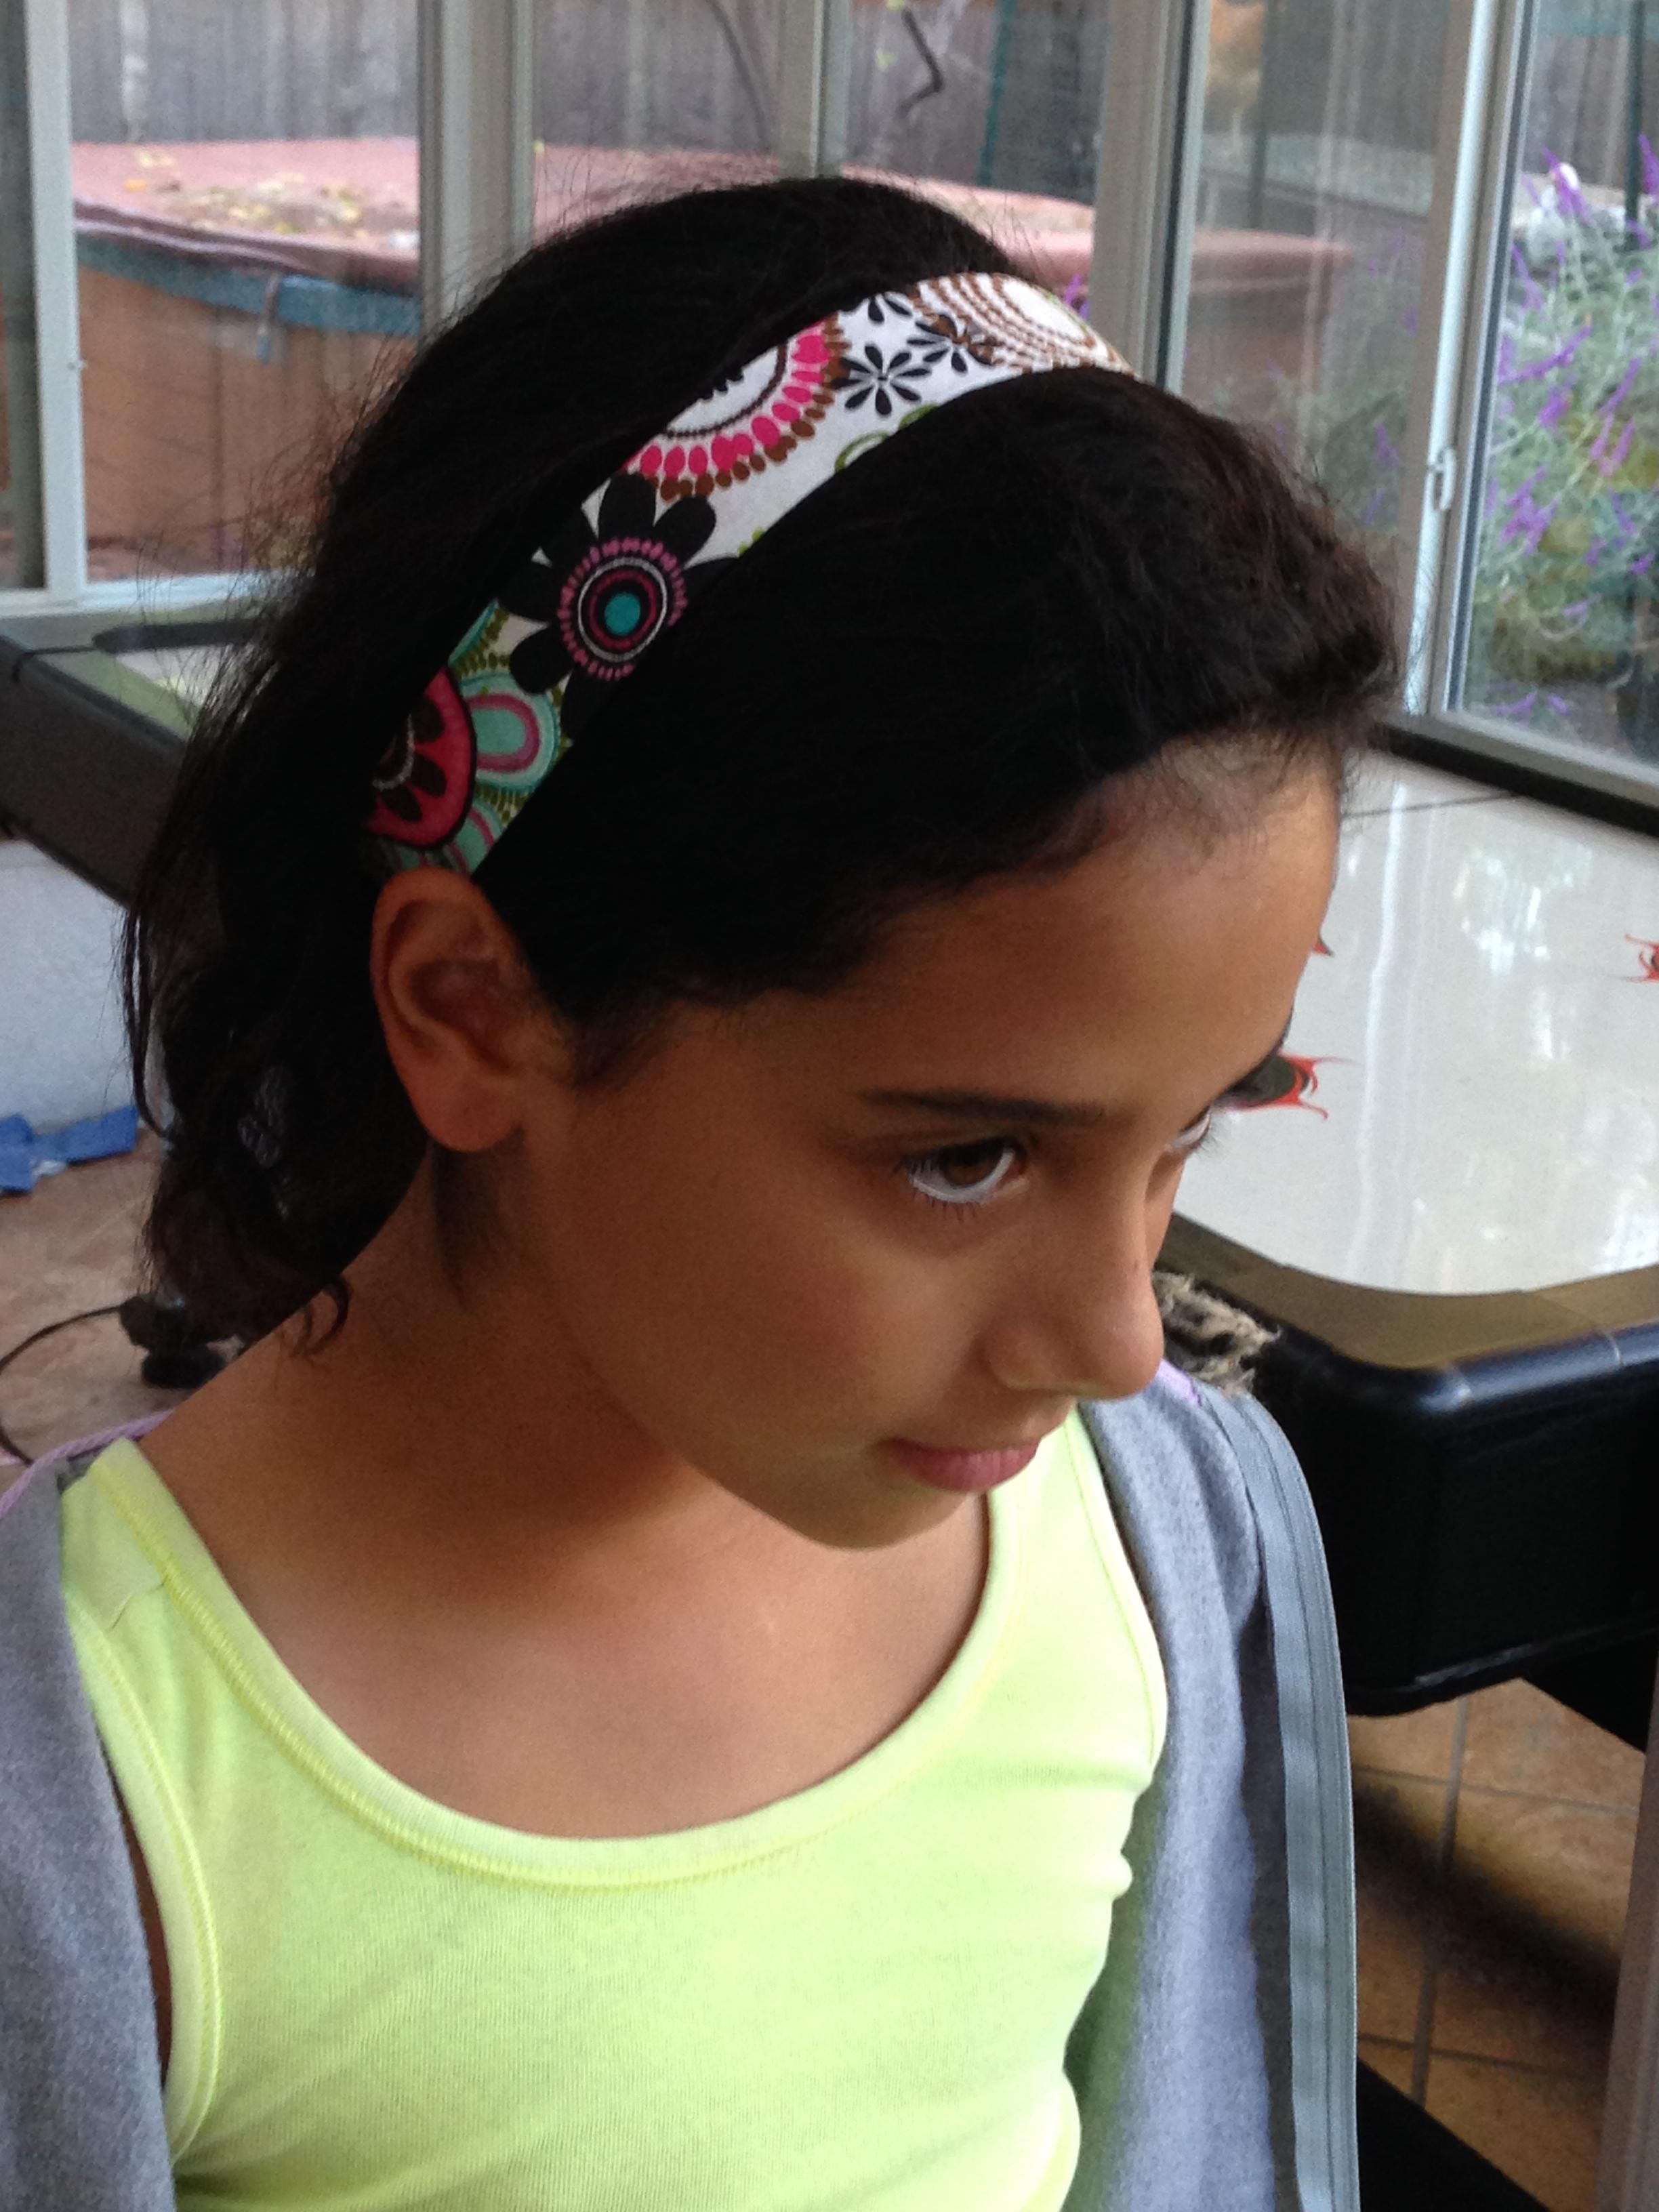 Student created headband.